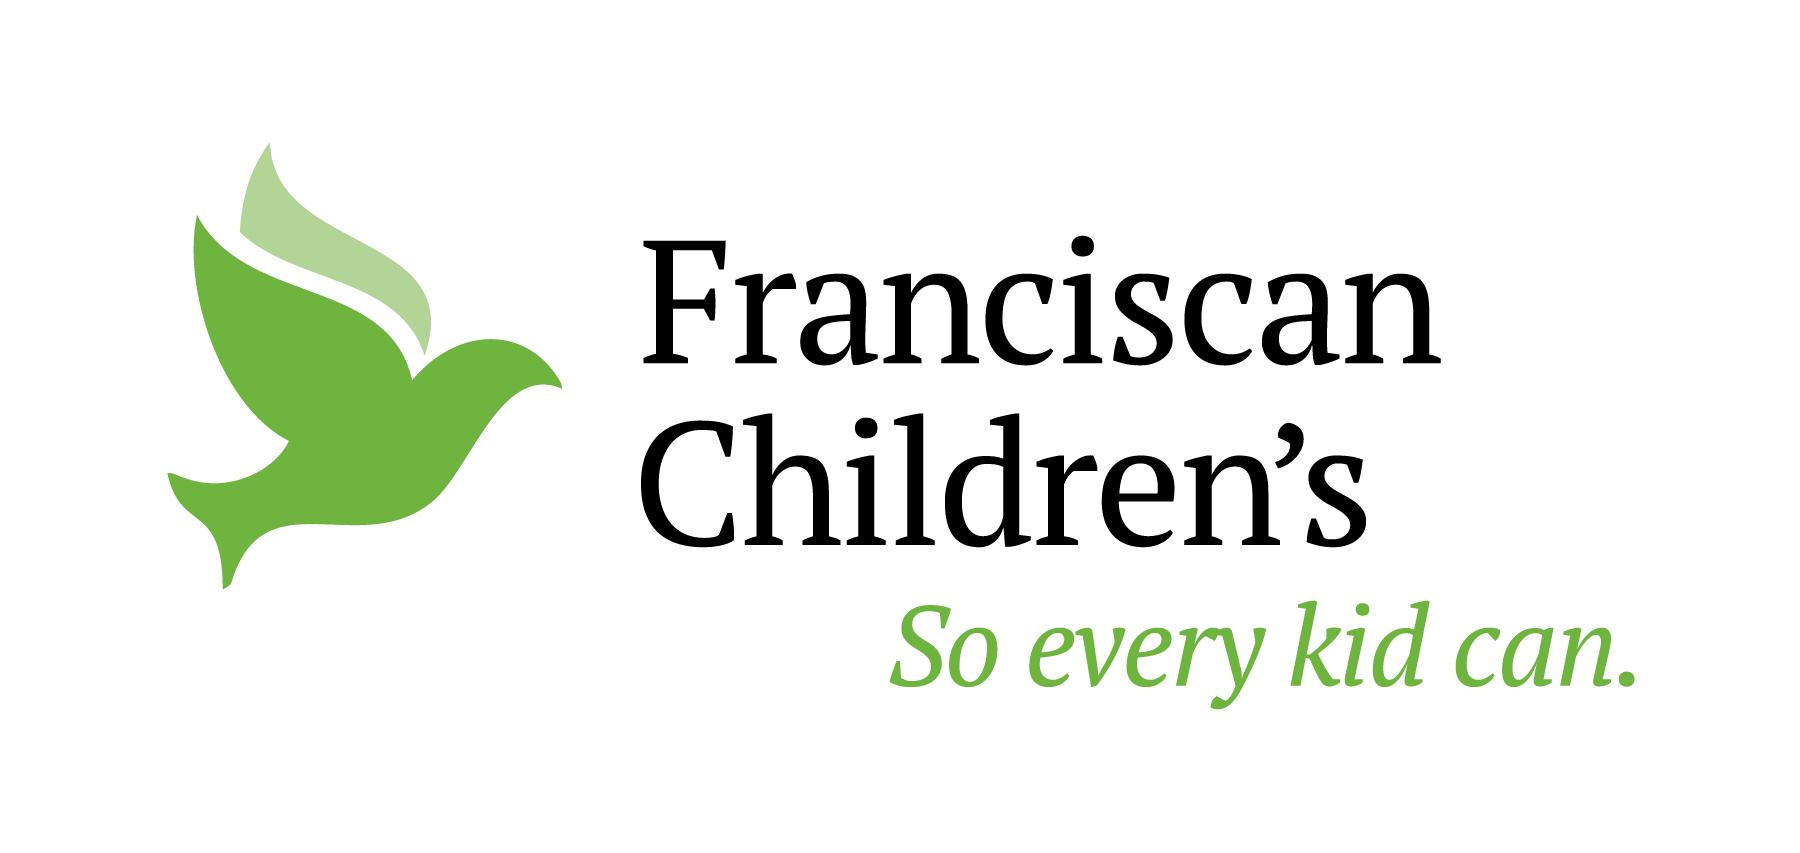 Inpatient Mental Health Franciscan Children S